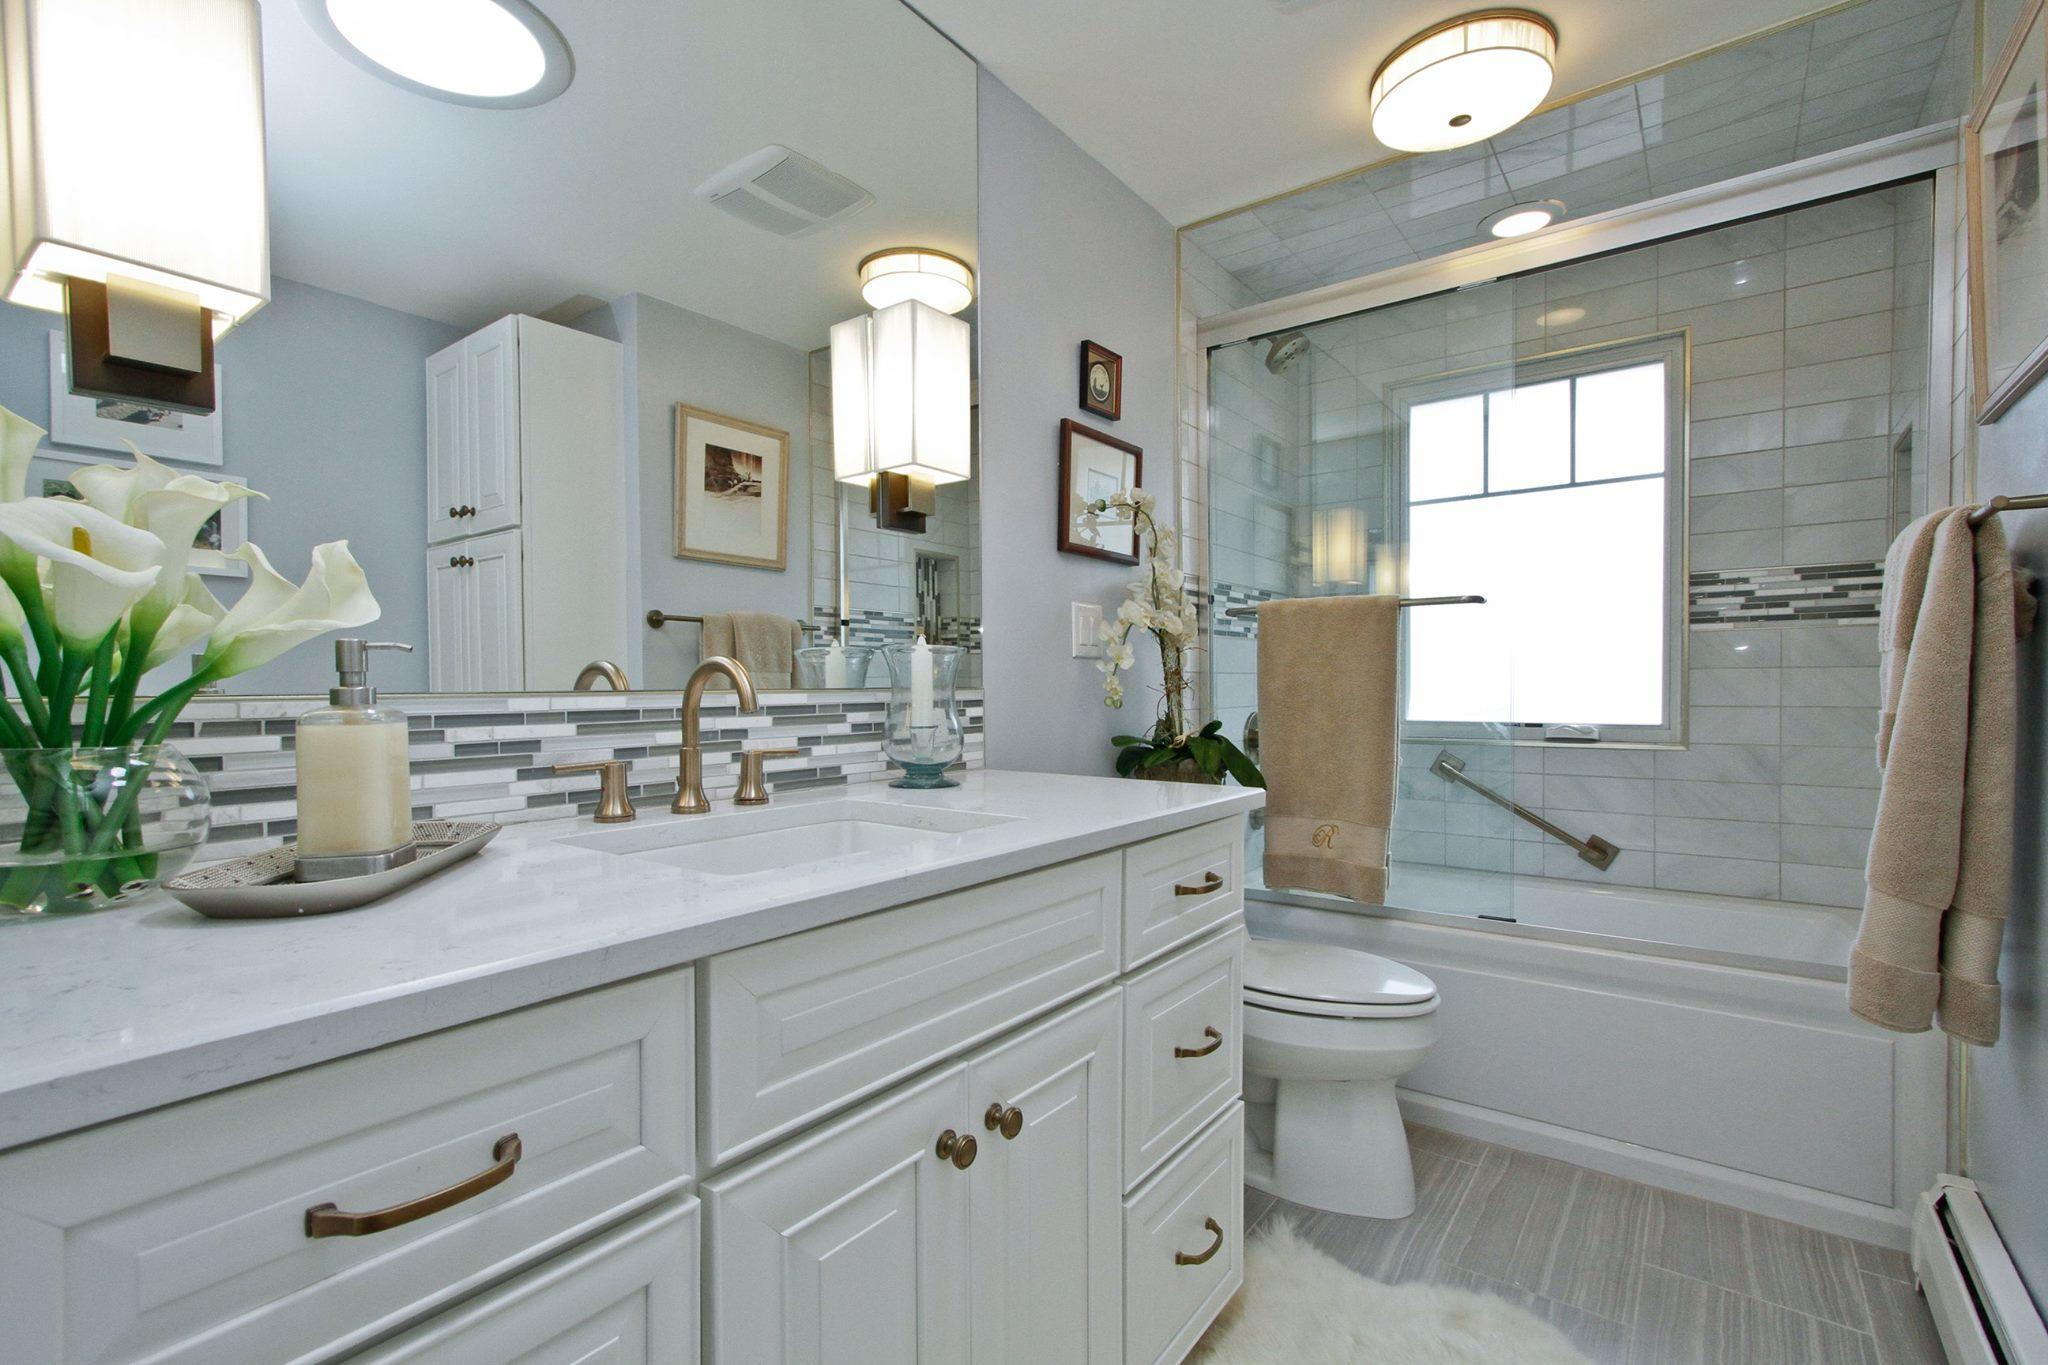 Cress Kitchen And Bath Wheat Ridge Co  Wow Blog